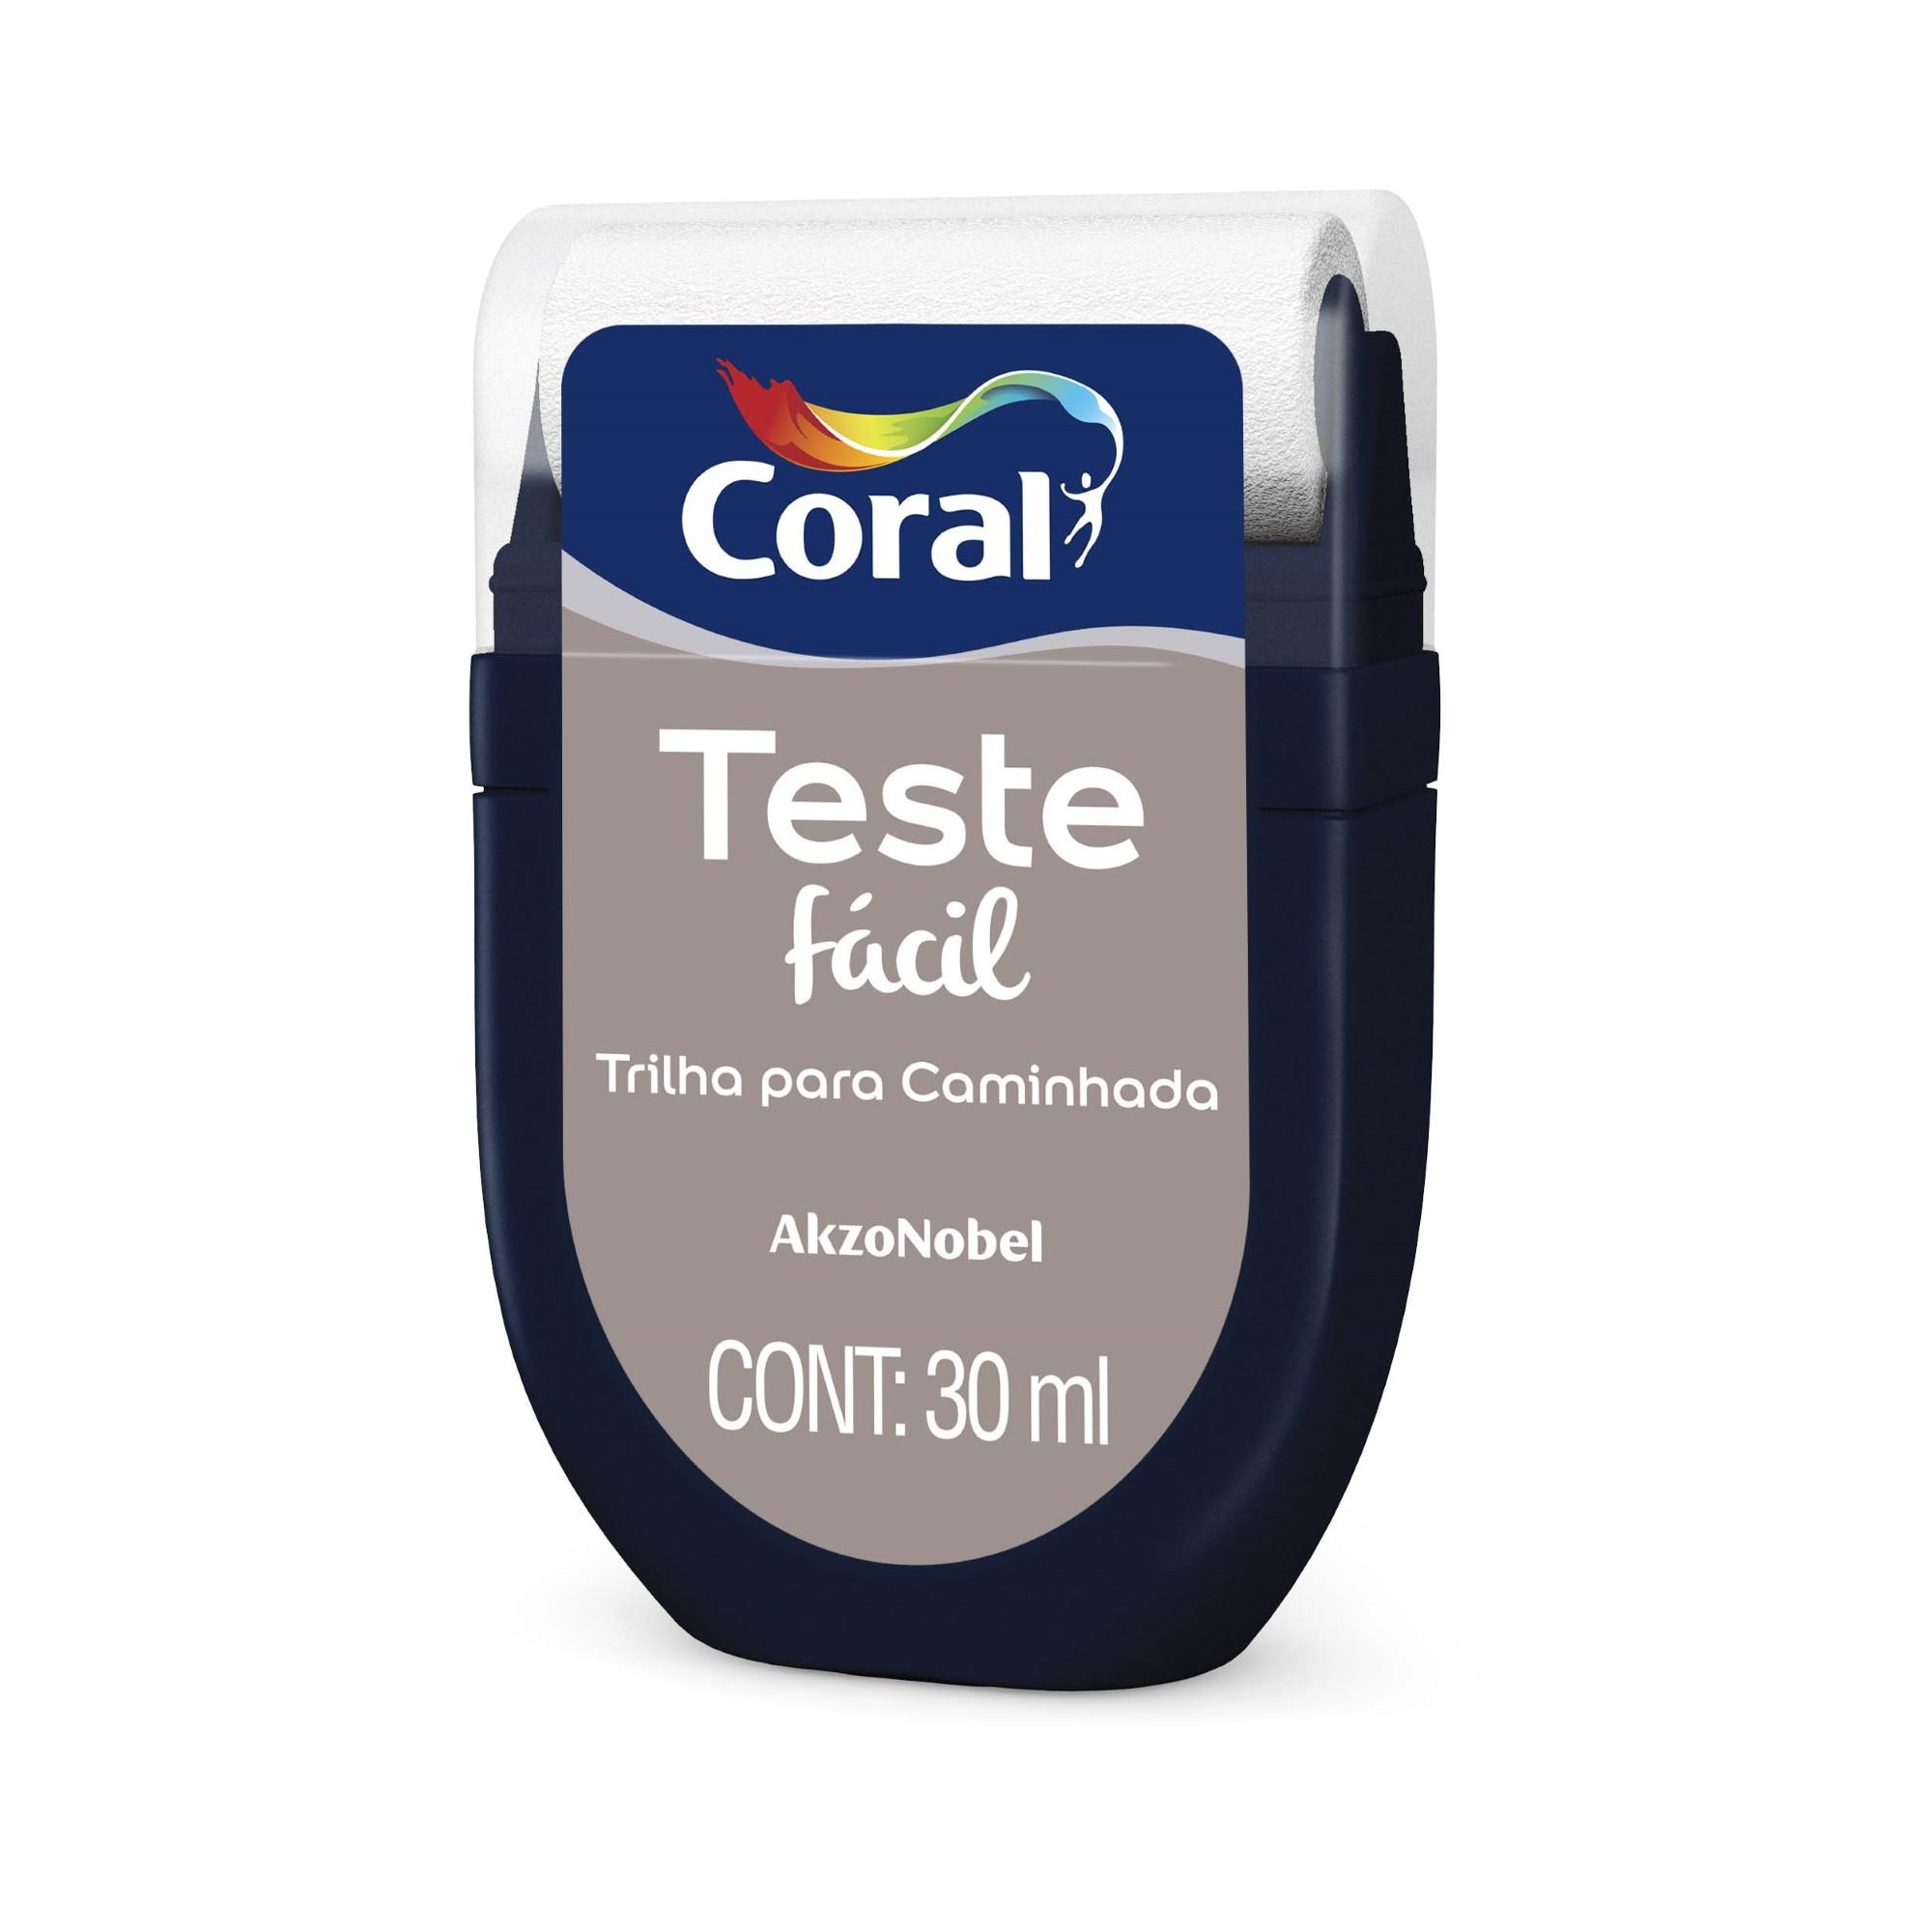 Teste Facil 30ml Trilha para Caminhada - Coral